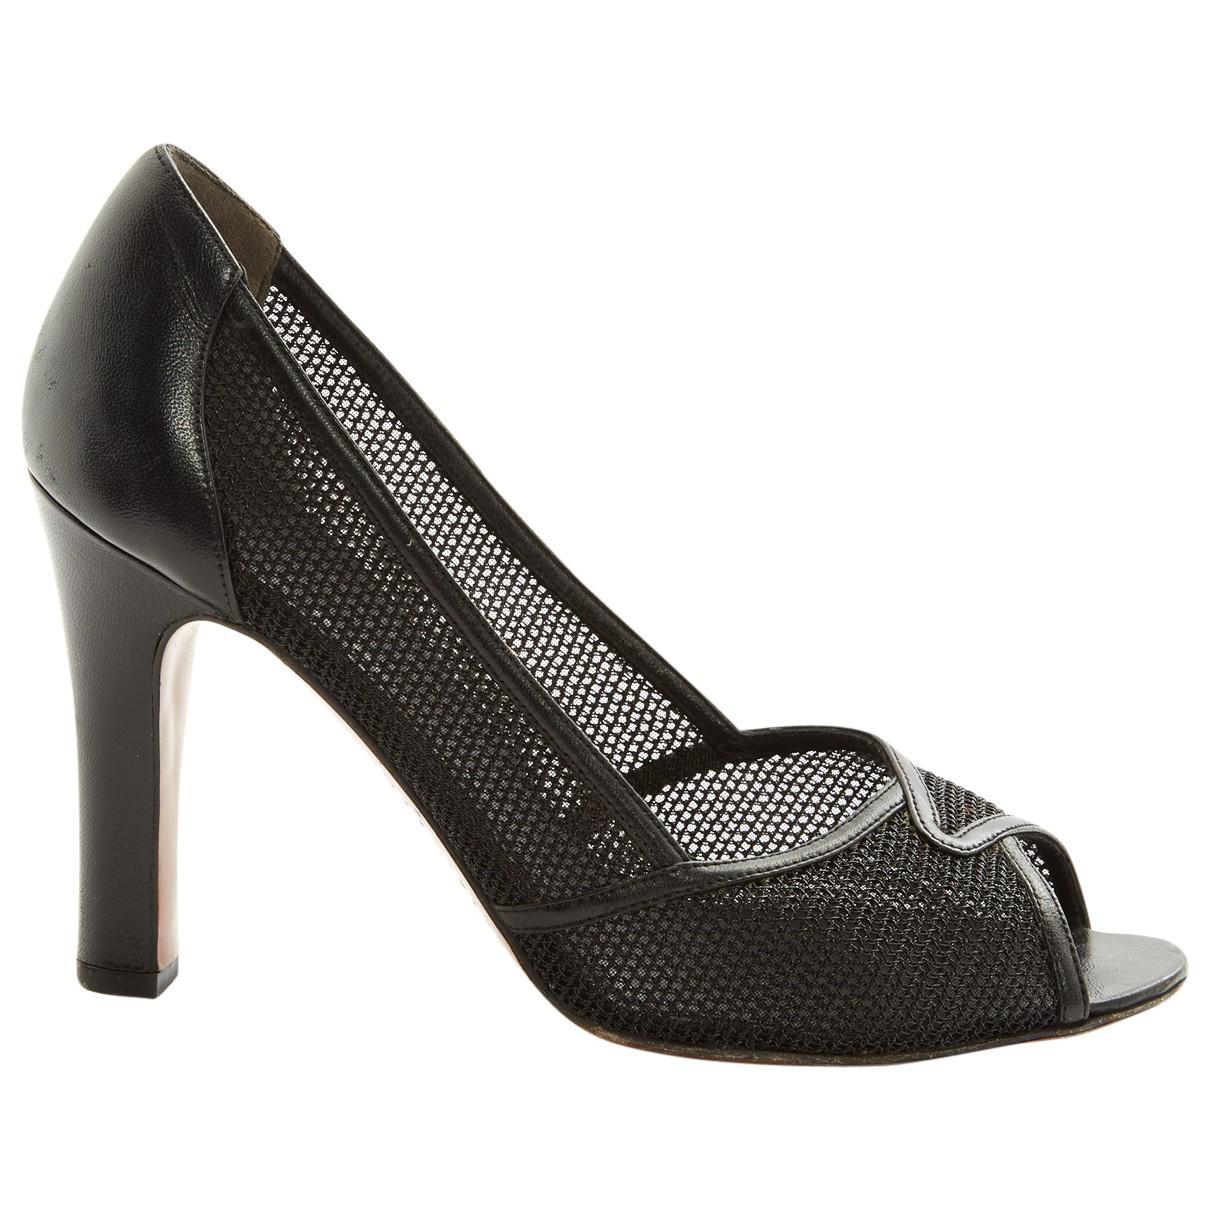 LOUIS VUITTON Grey / Leather Heels efHde4O2